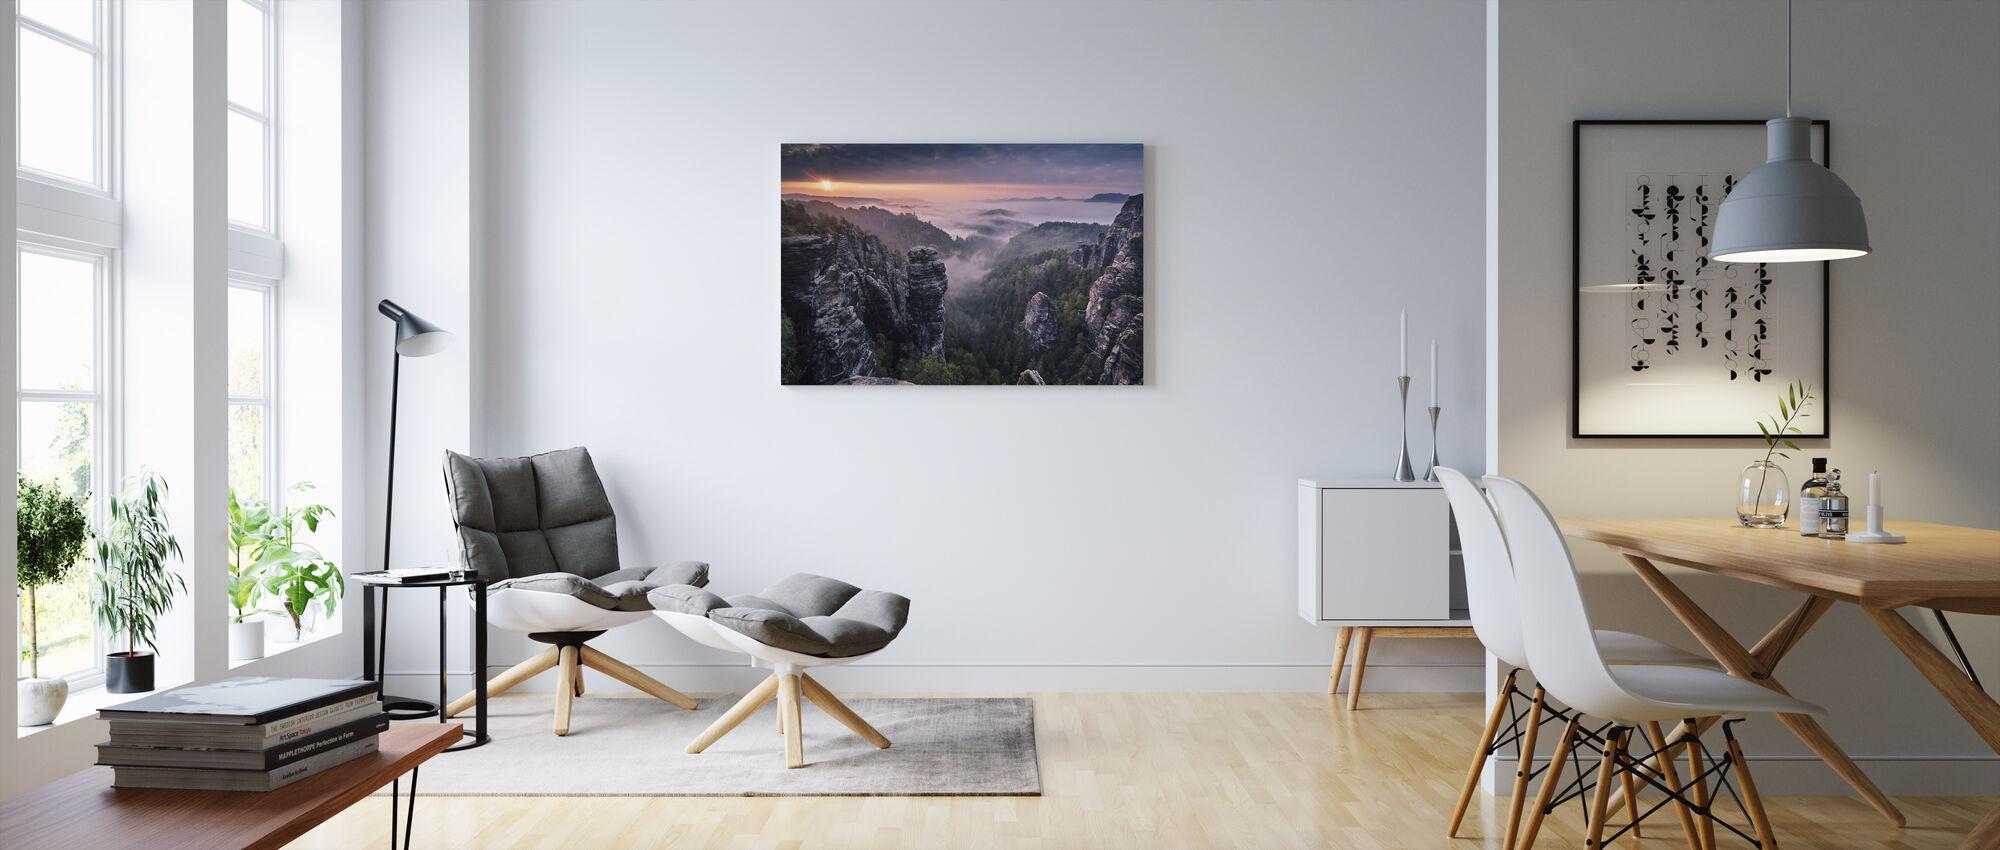 Zonsopgang op de rotsen - Canvas print - Woonkamer